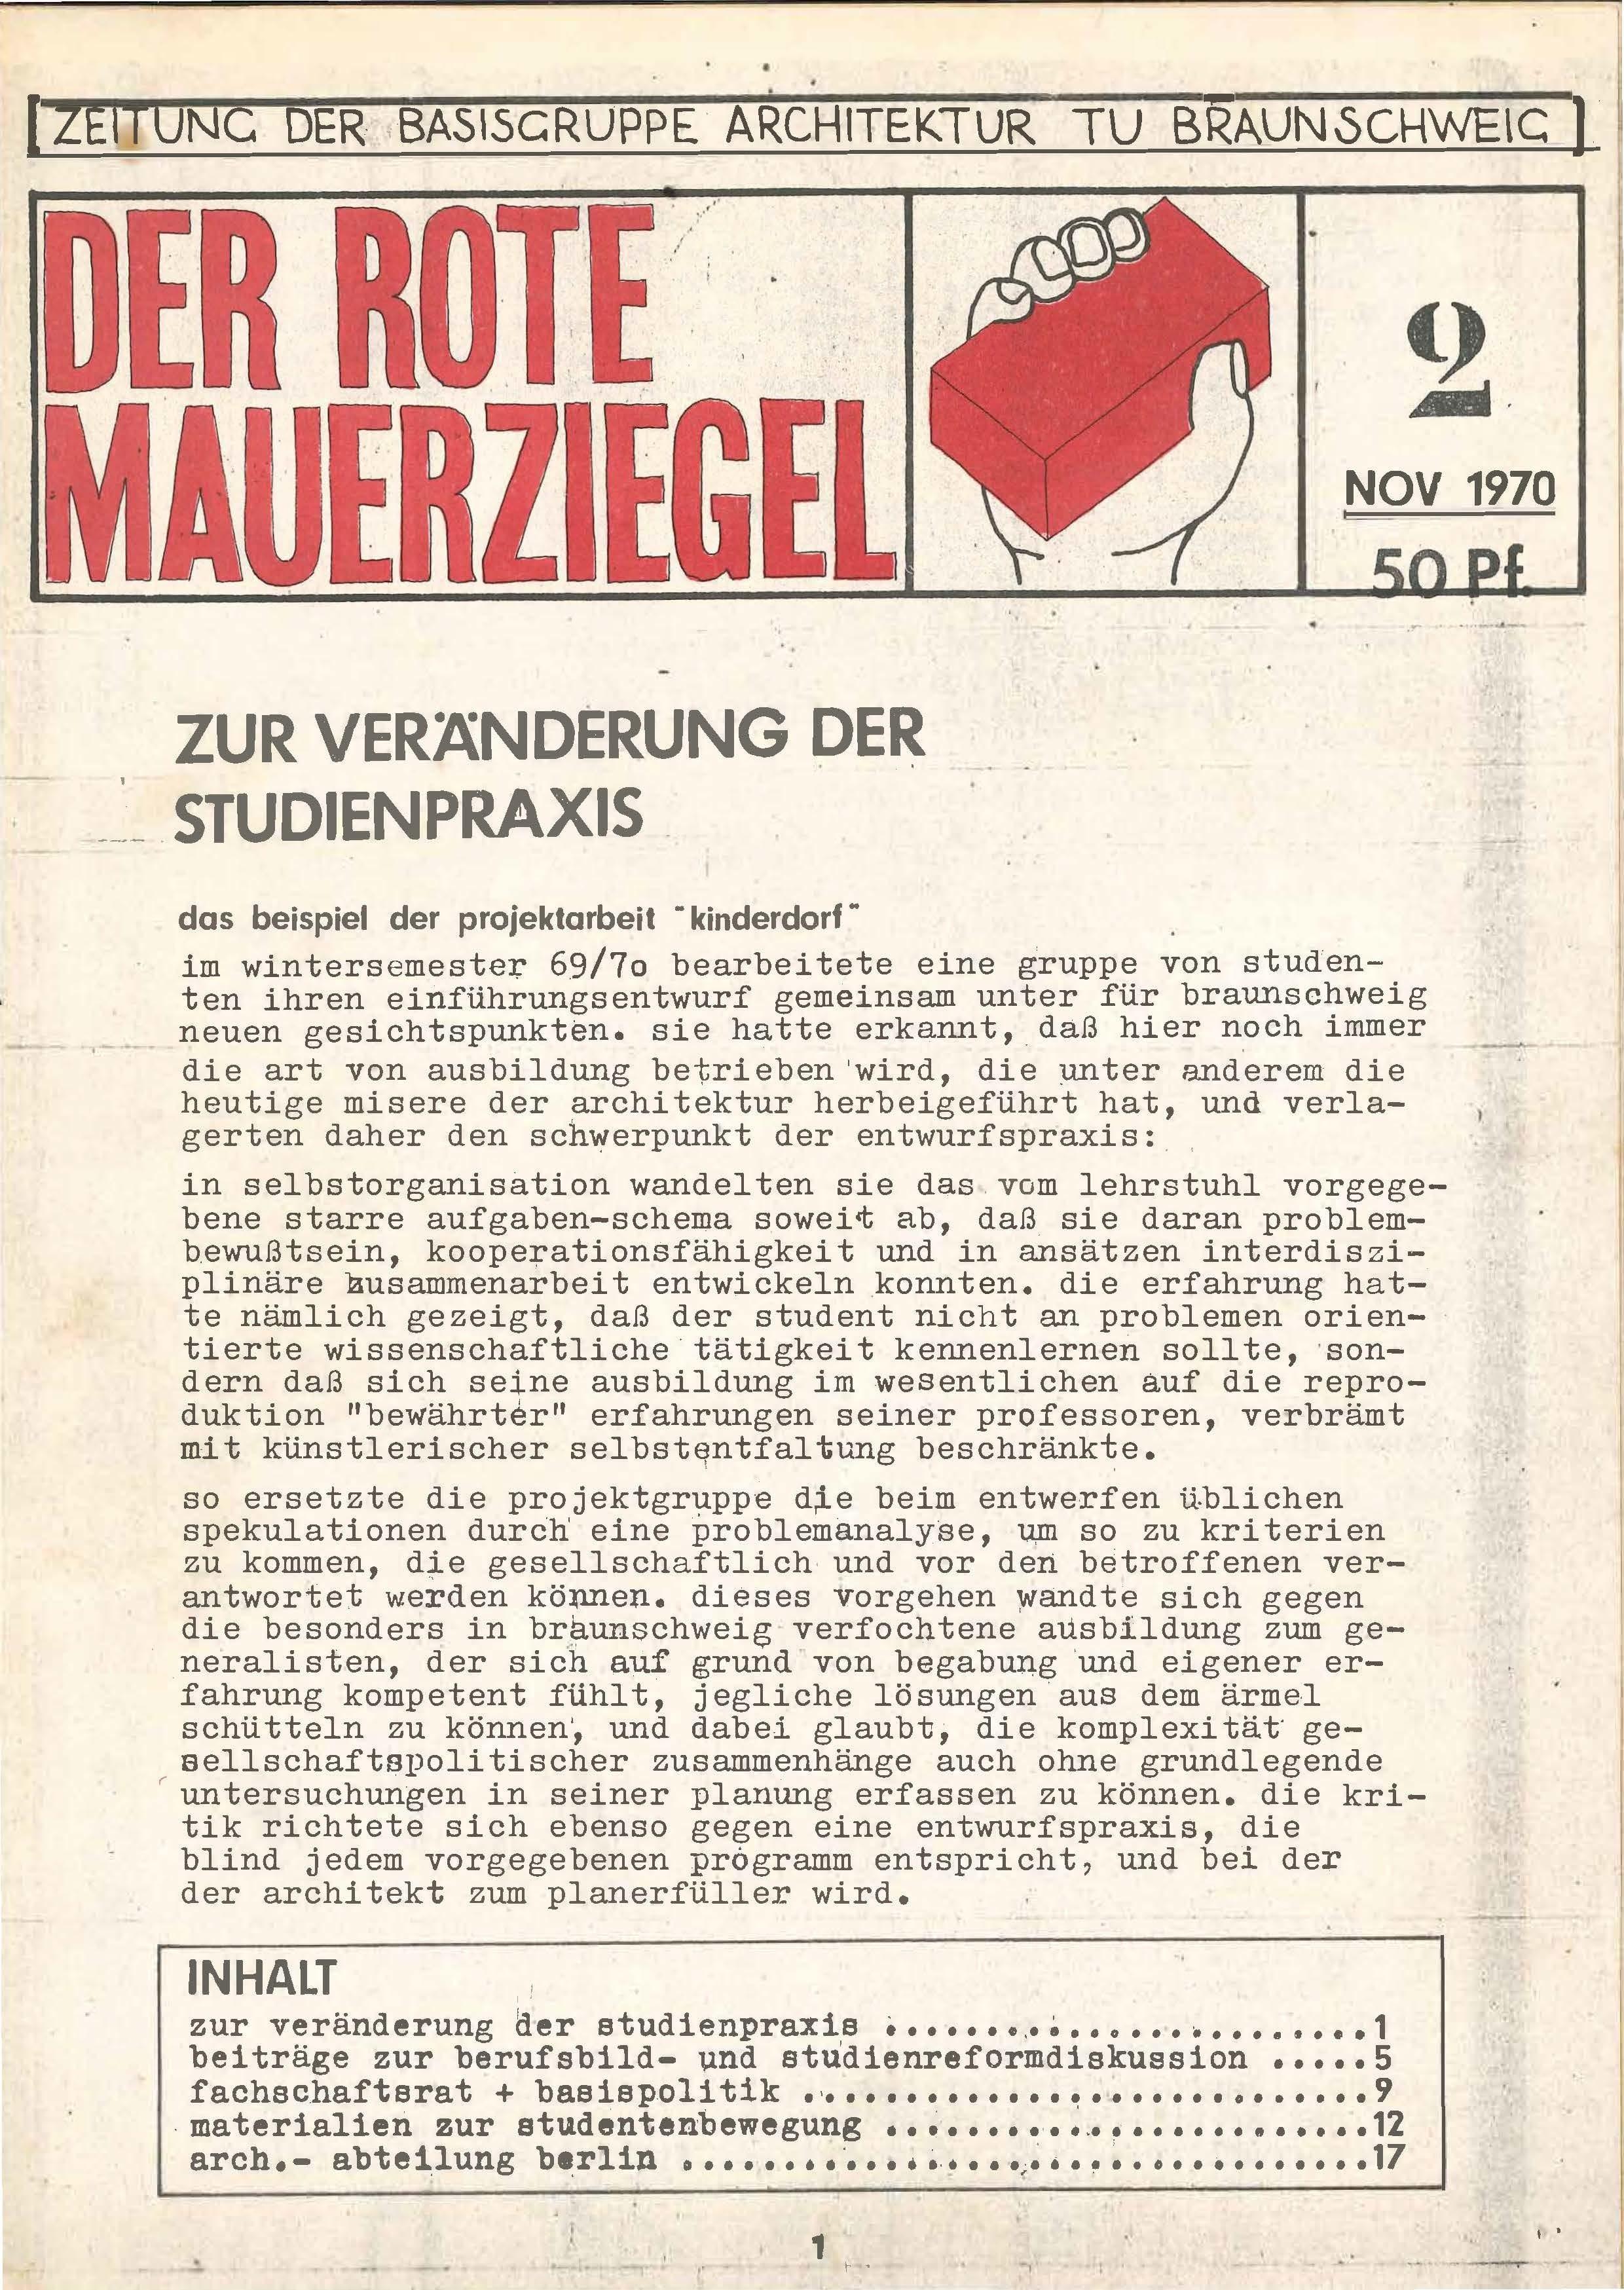 SAIB G74 III 2 Der Rote Mauerziegel Page 01